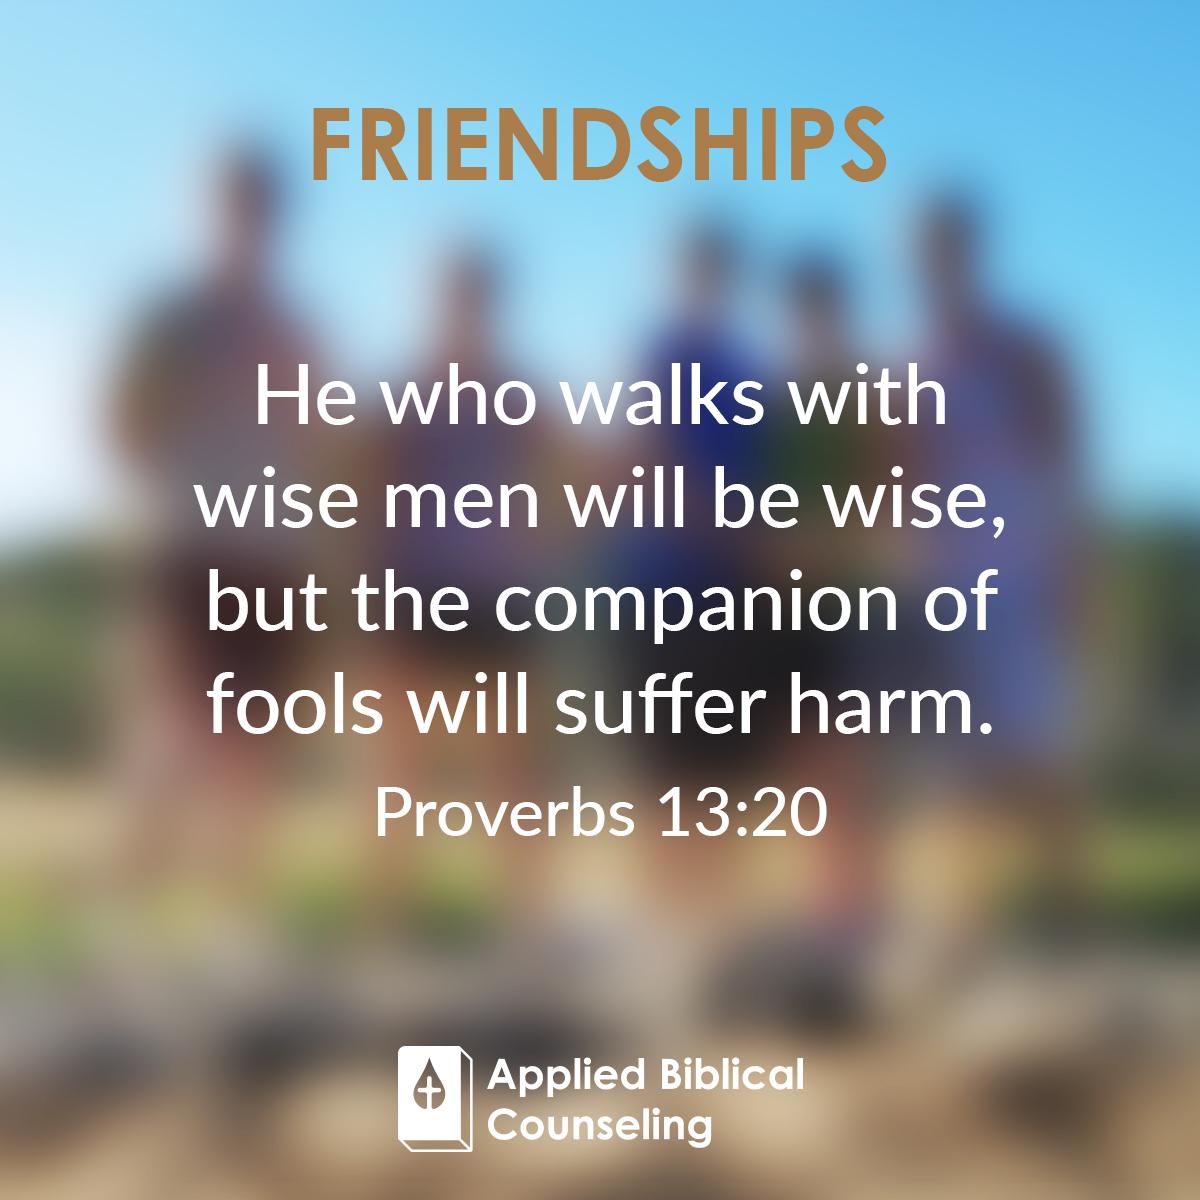 ABC Facebook w13 friendships 5